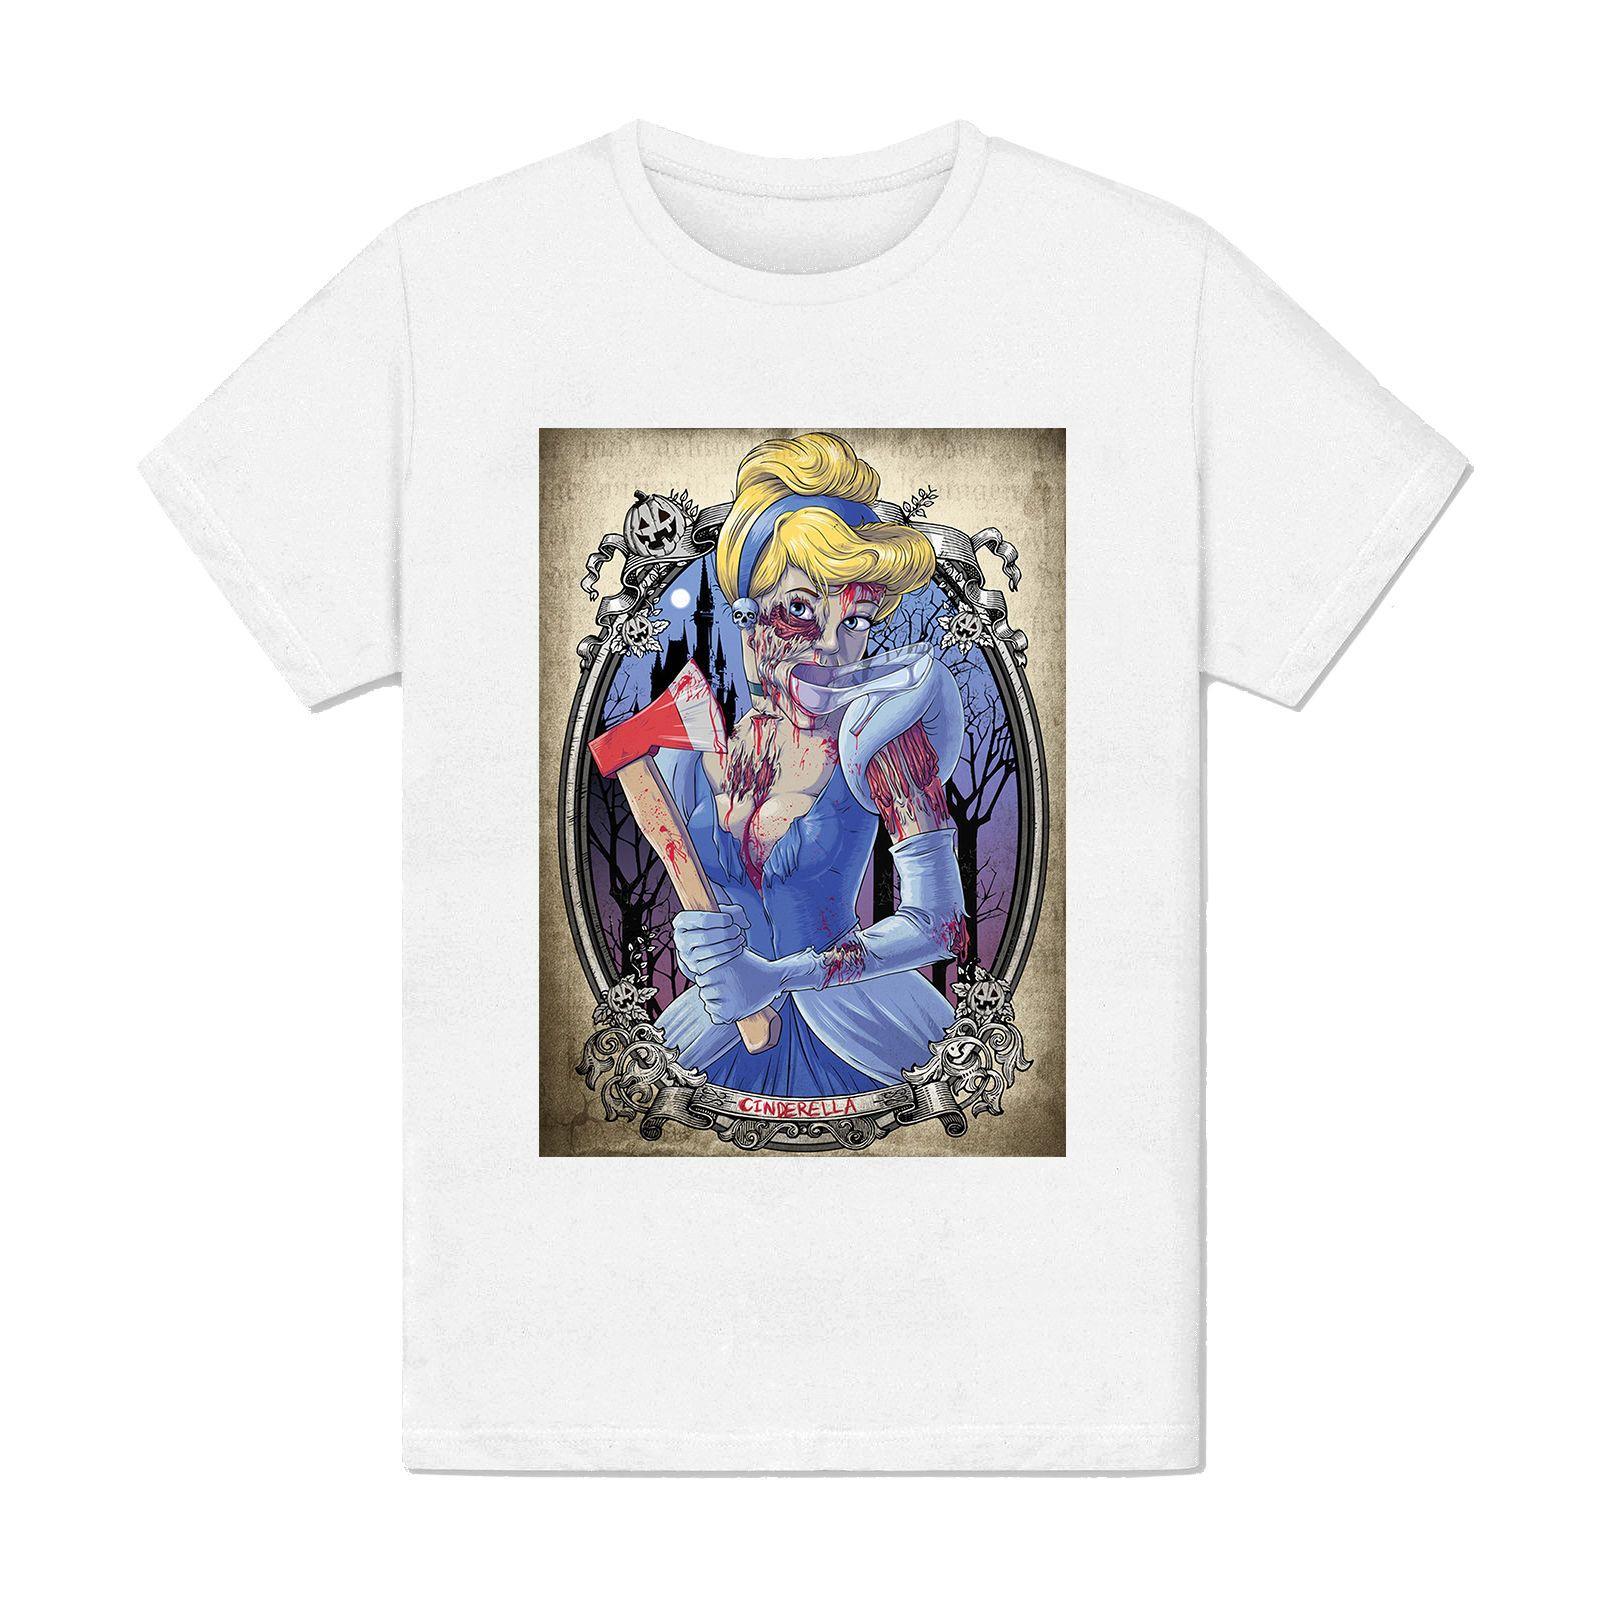 T Shirt Homme Zombie Cendrillon Parodie Tatouage Princesse Top Tee